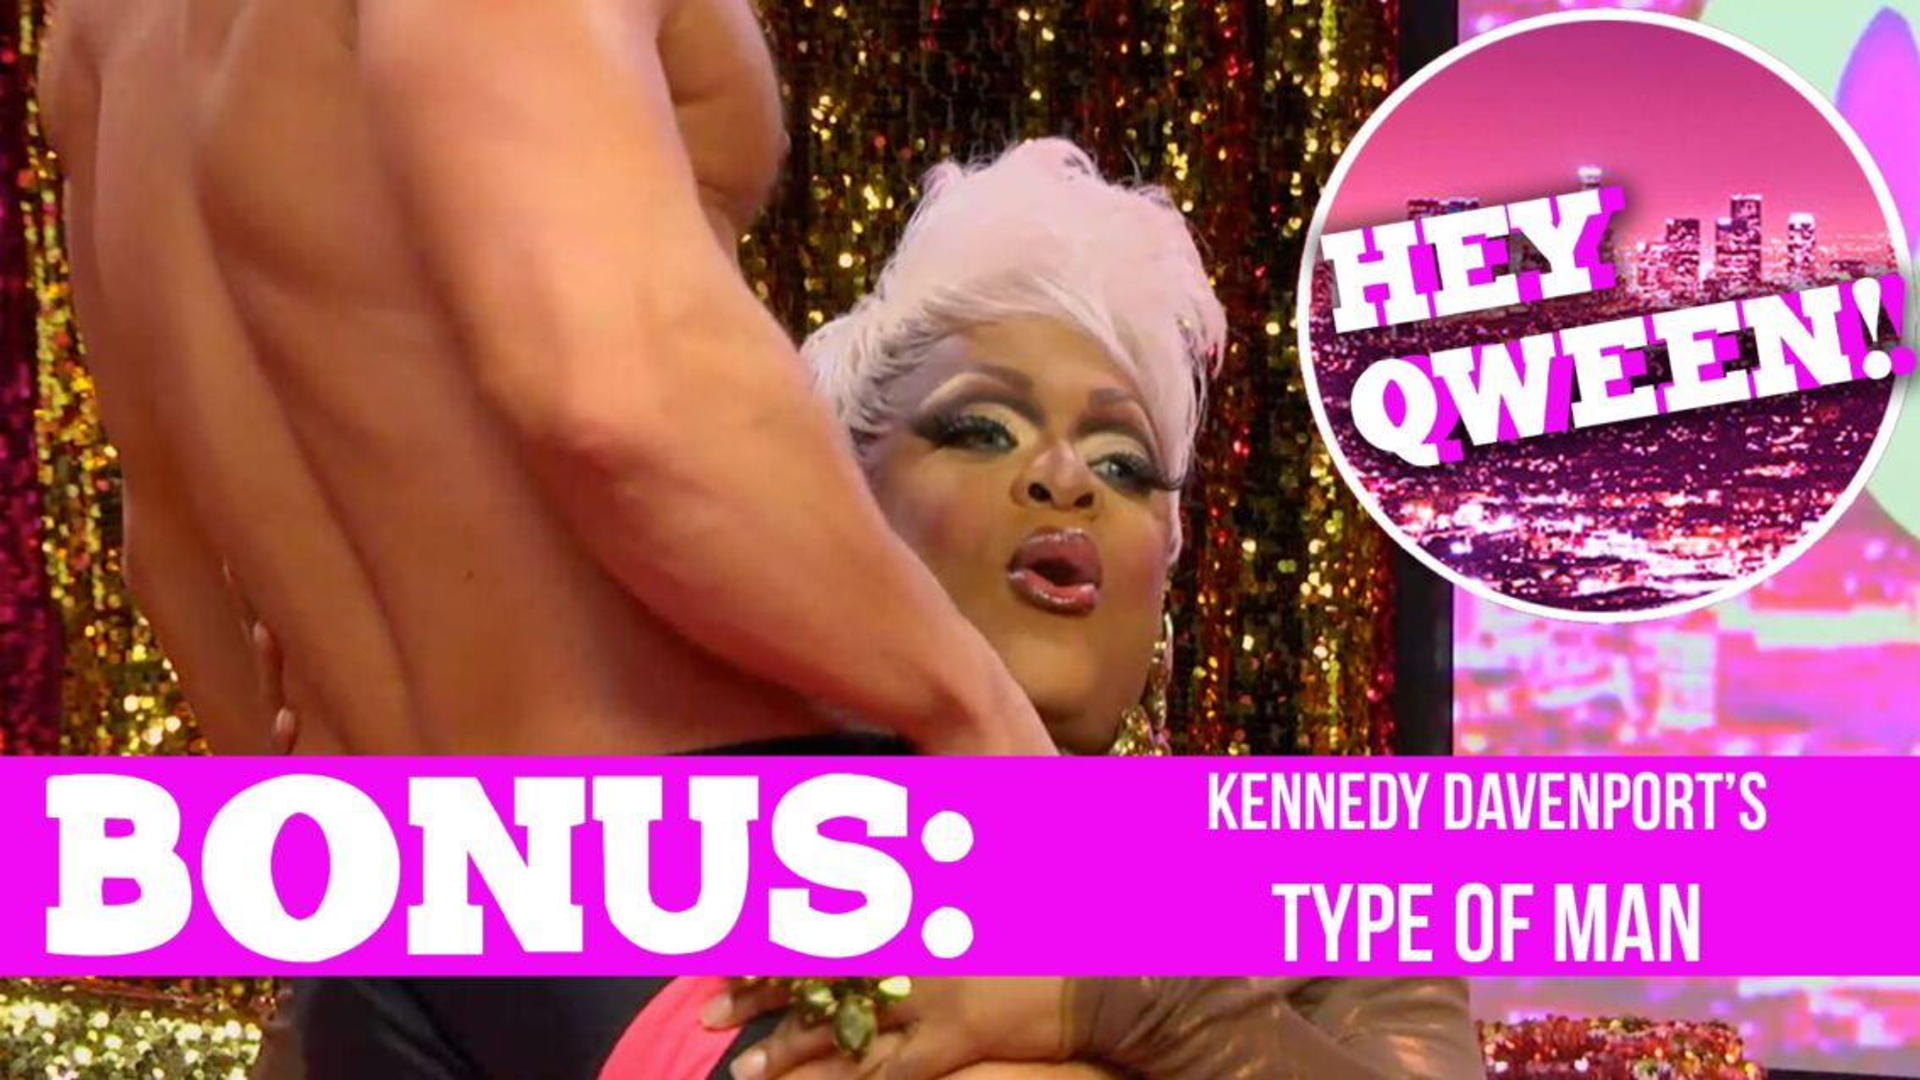 Hey Qween! BONUS: Kennedy Davenport's Type Of Man